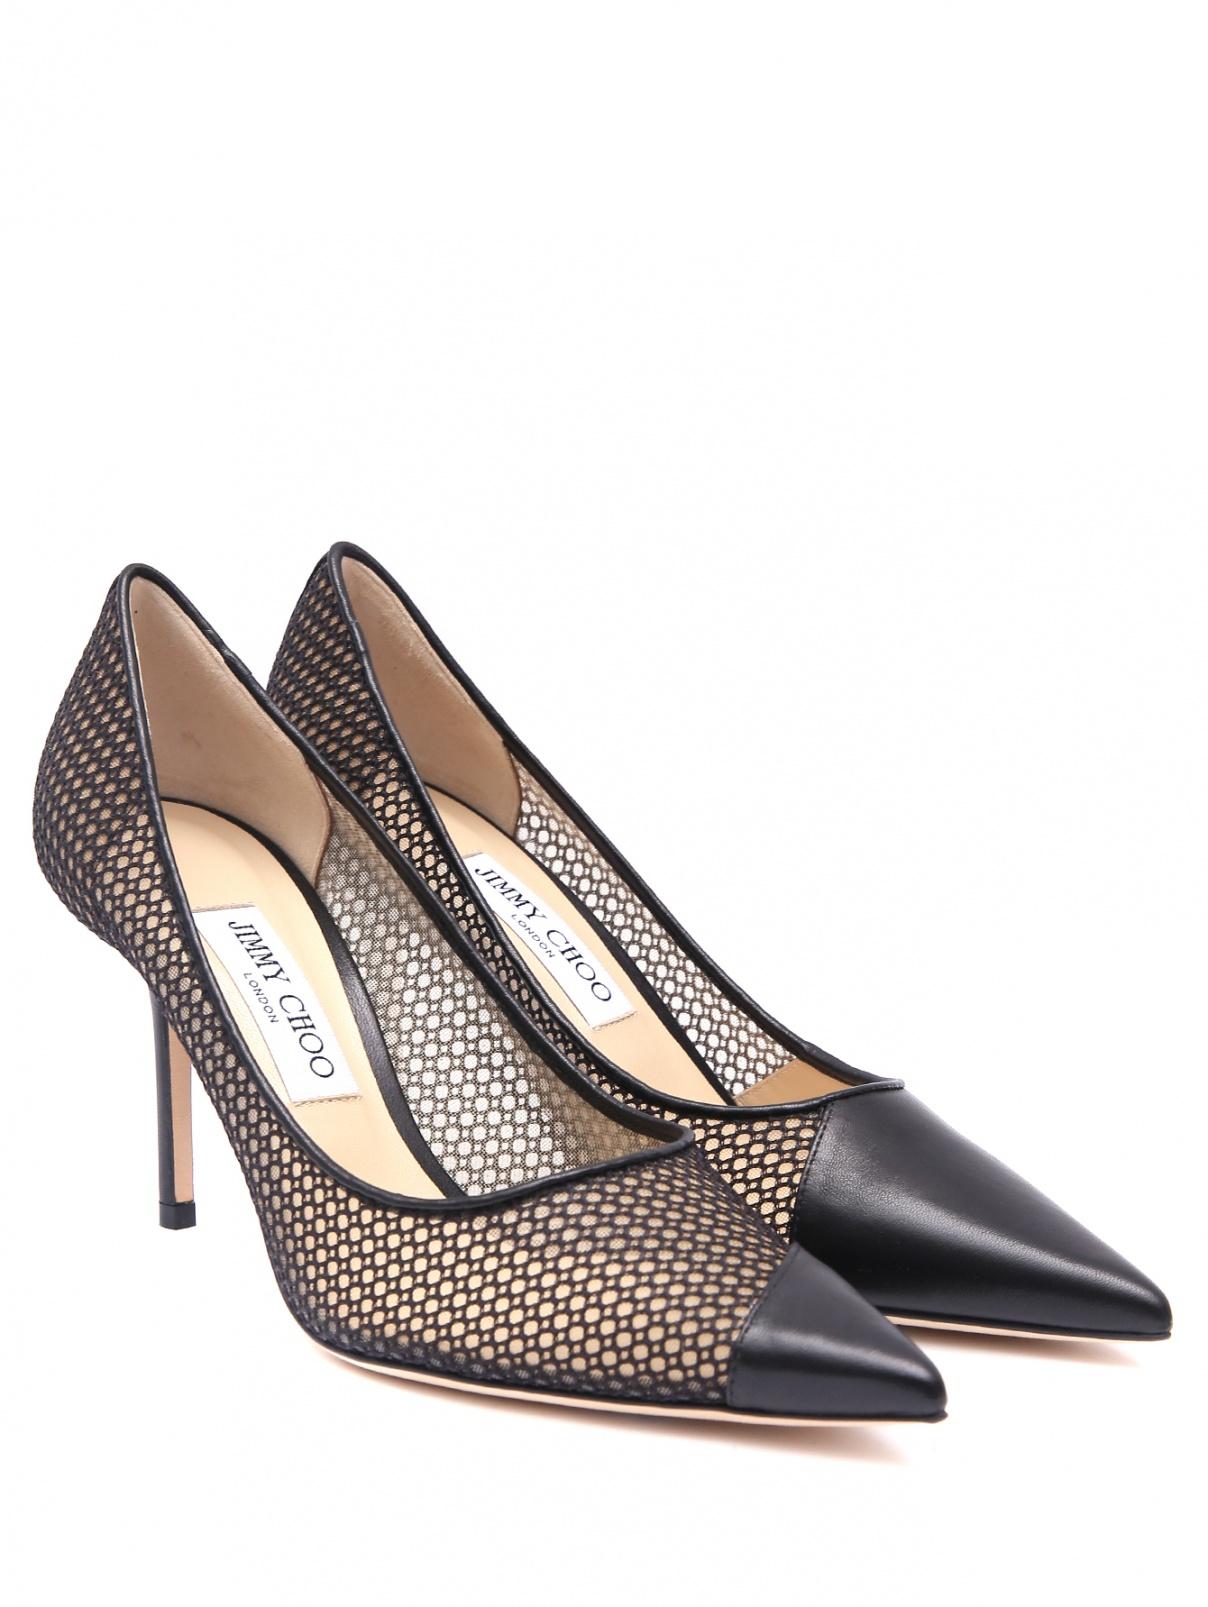 Туфли из текстиля и кожи на шпильке Jimmy Choo  –  Общий вид